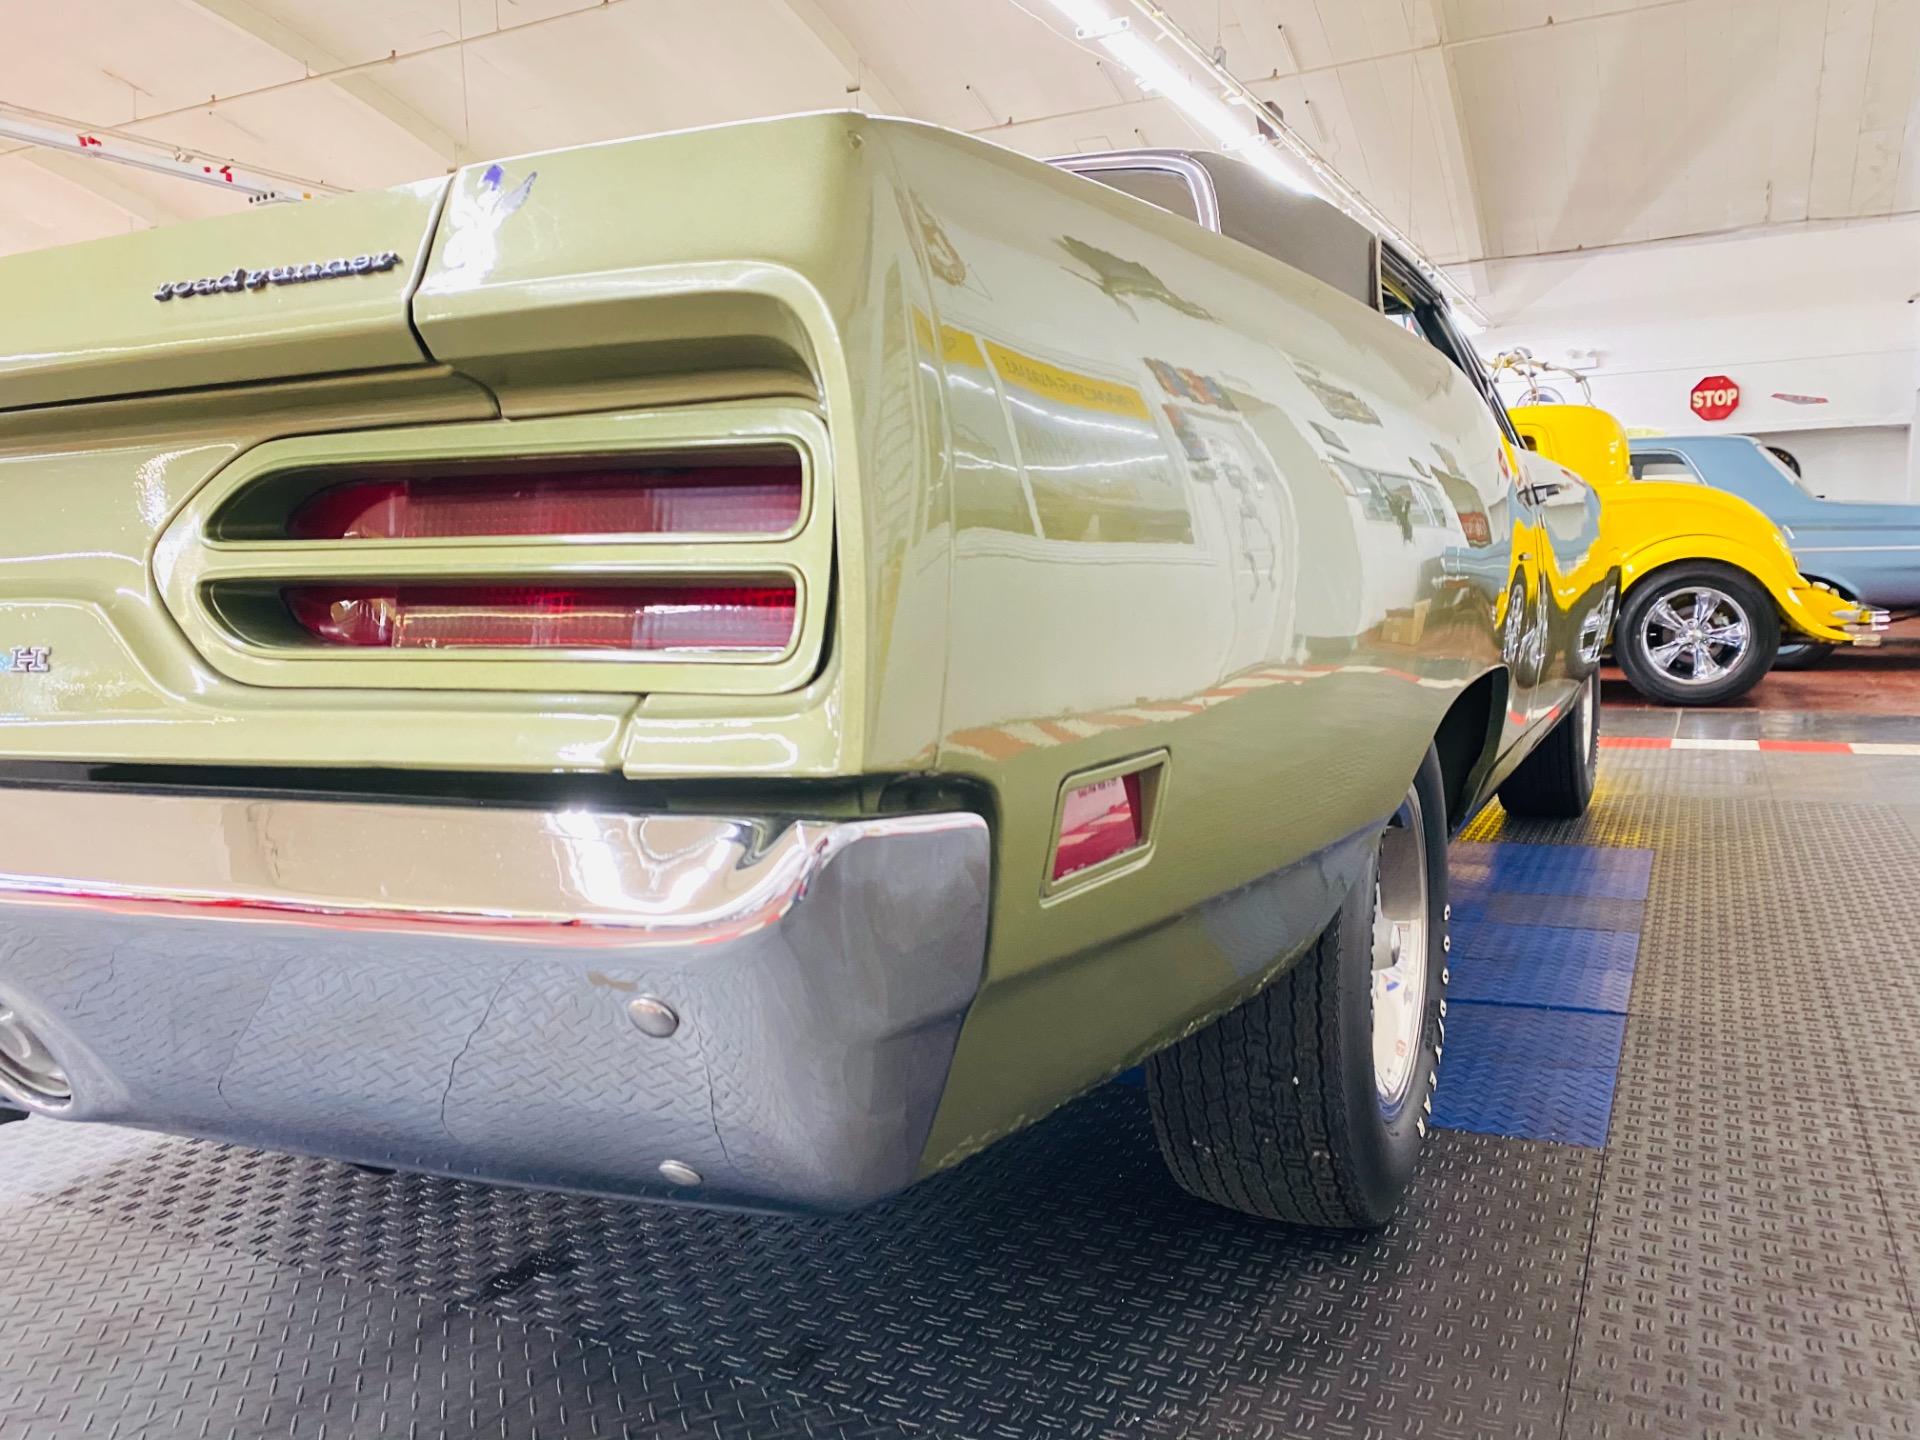 Used 1970 Plymouth Roadrunner - FACTORY V CODE 440 6 PACK -AIR GRABBER- CLEAN ORIGINAL FLOORS-  SEE VIDEO | Mundelein, IL